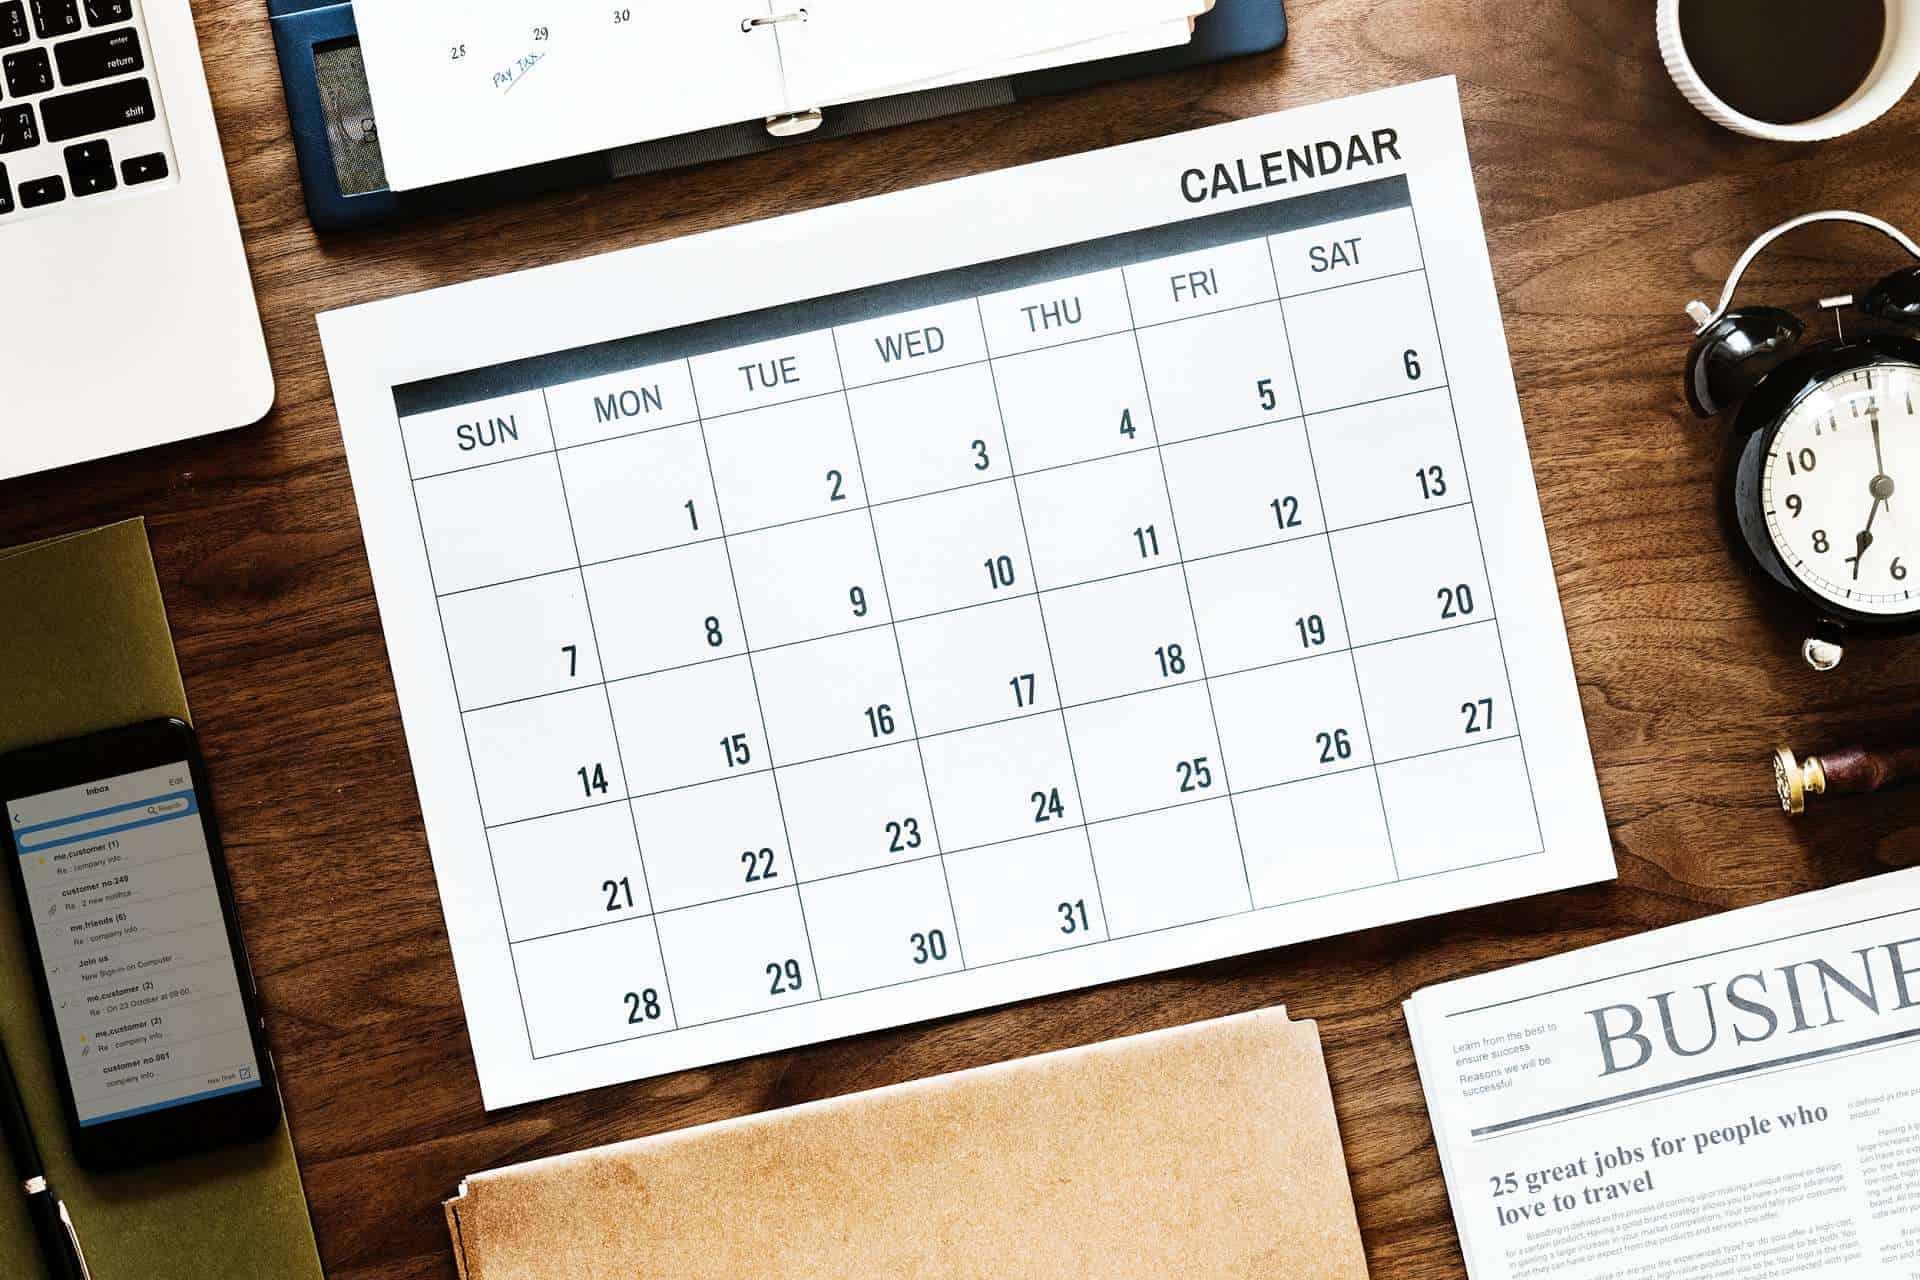 Moving – Part 2: Making & Communicating Plans